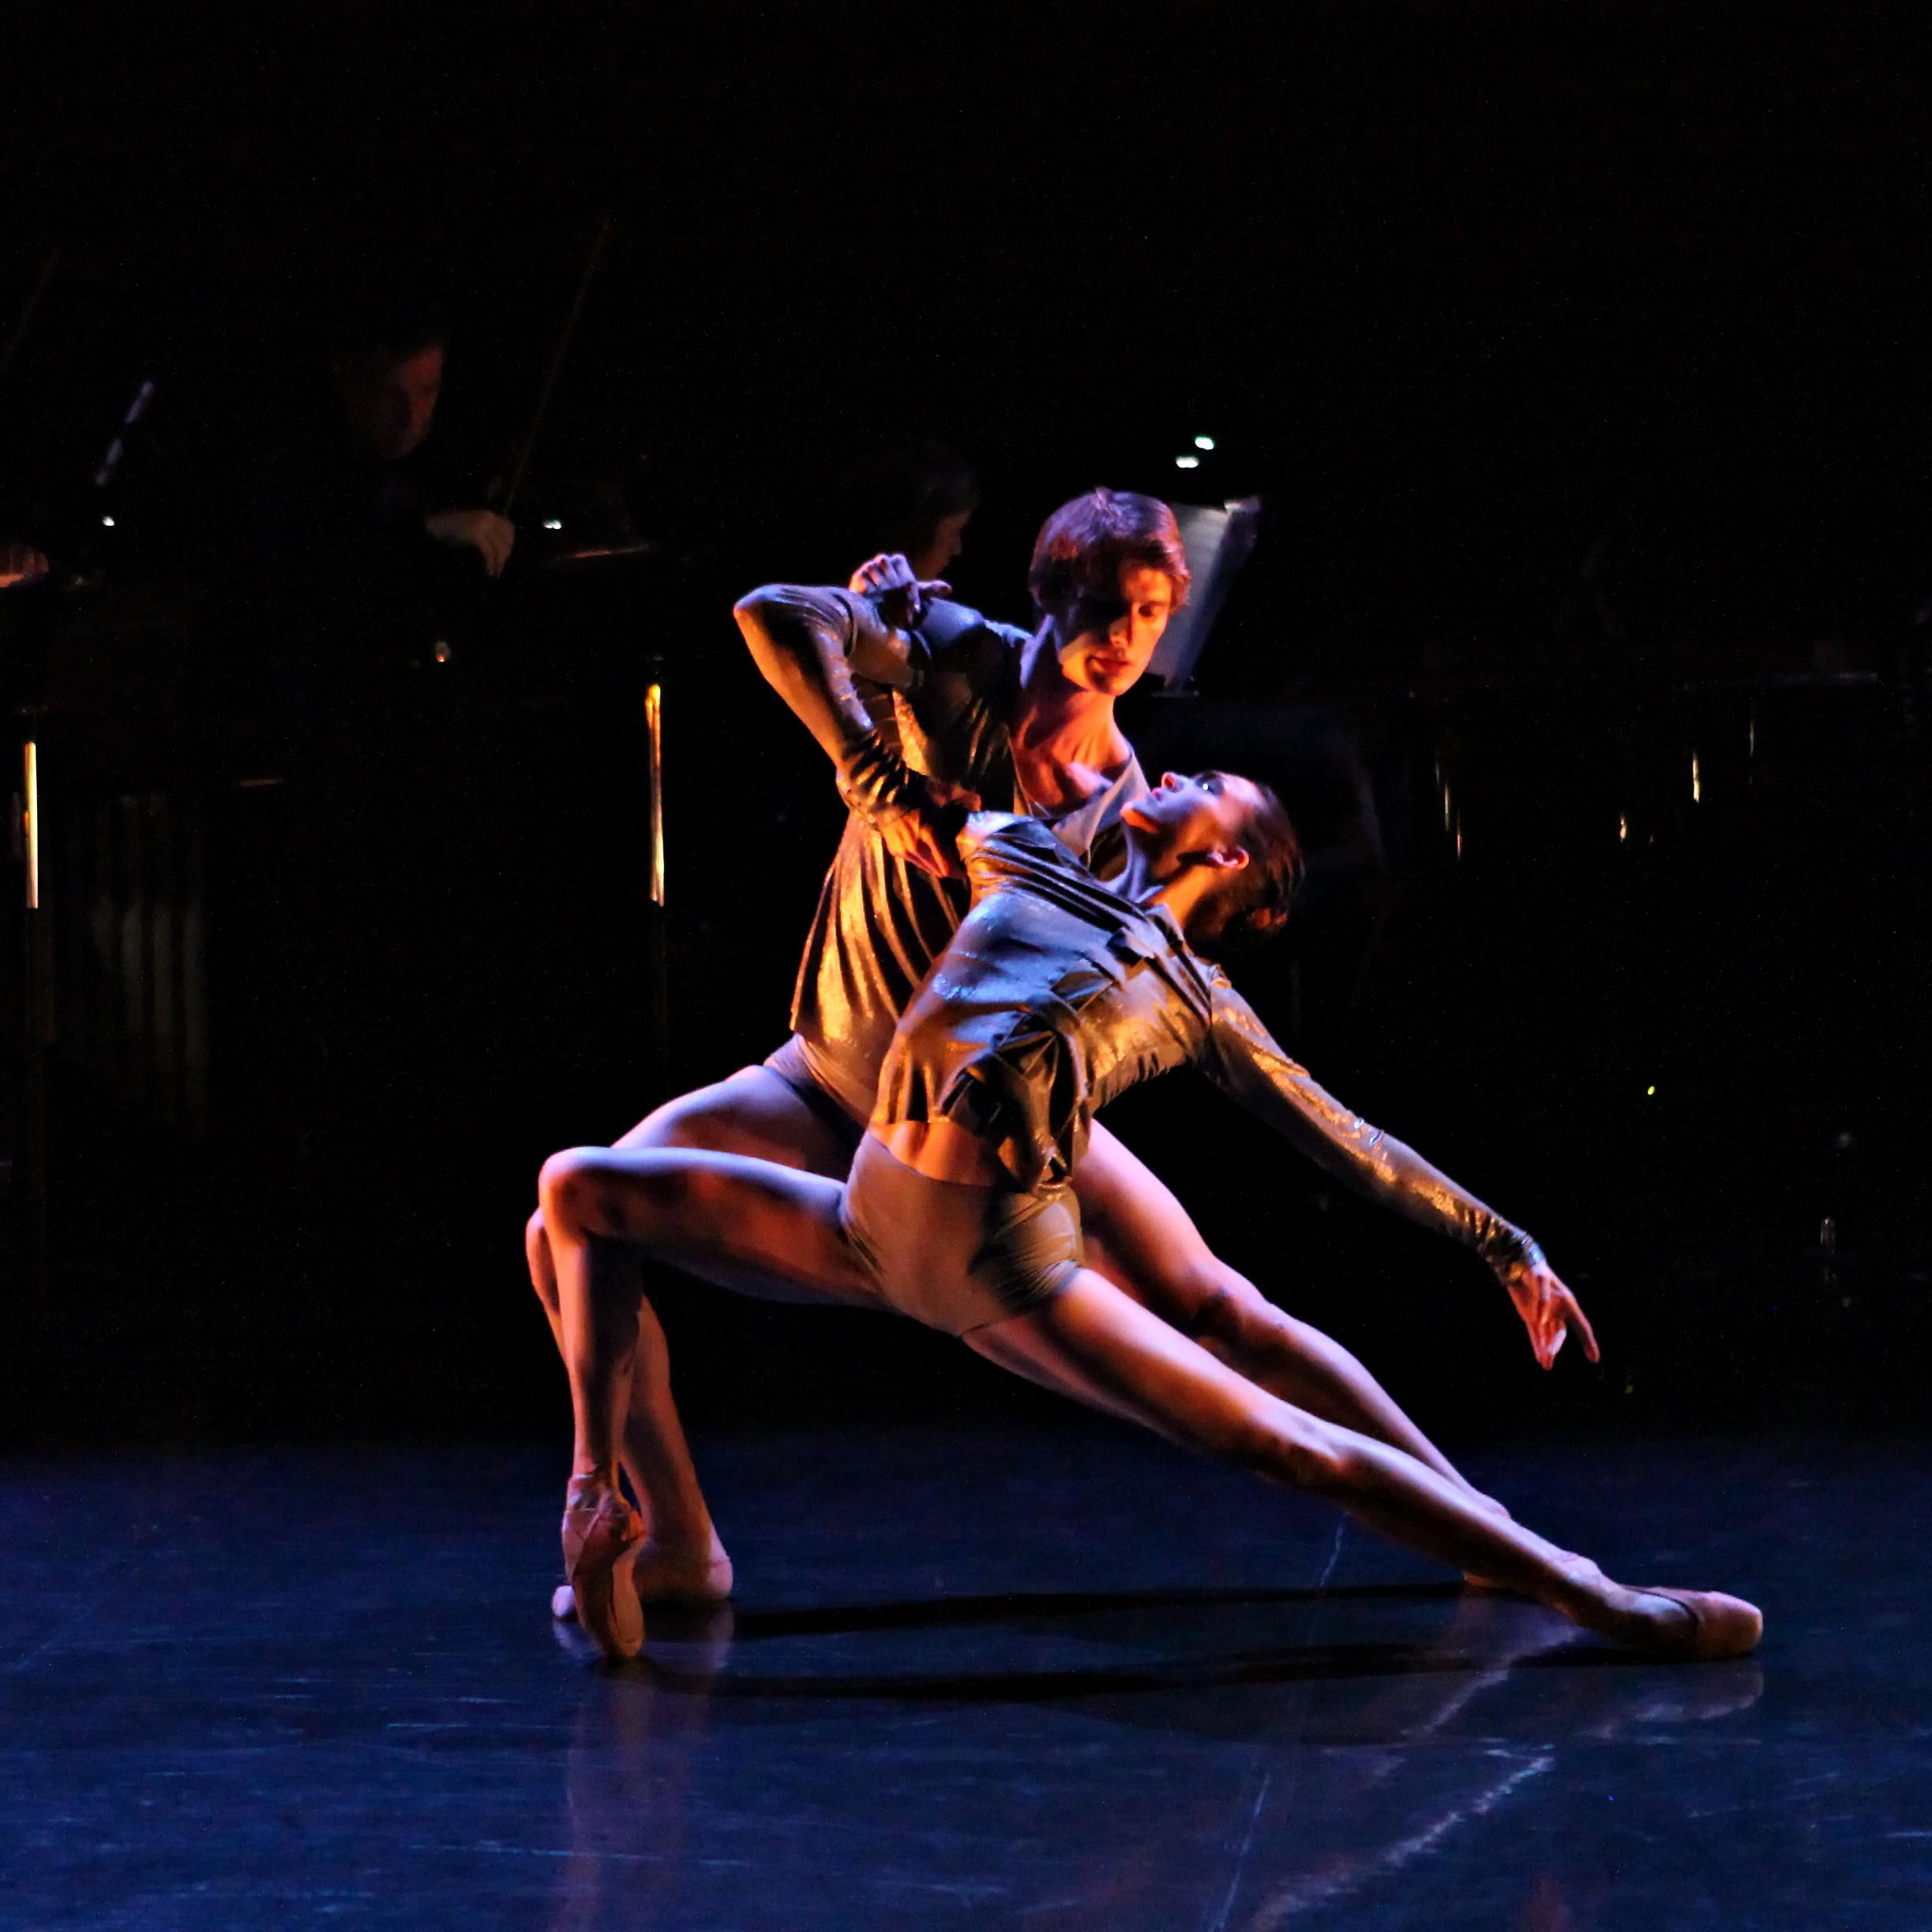 Queensland Ballet dancers Clare Morehen and Keian Langdon in Equilibrium Level Photographer Ken Sparrow